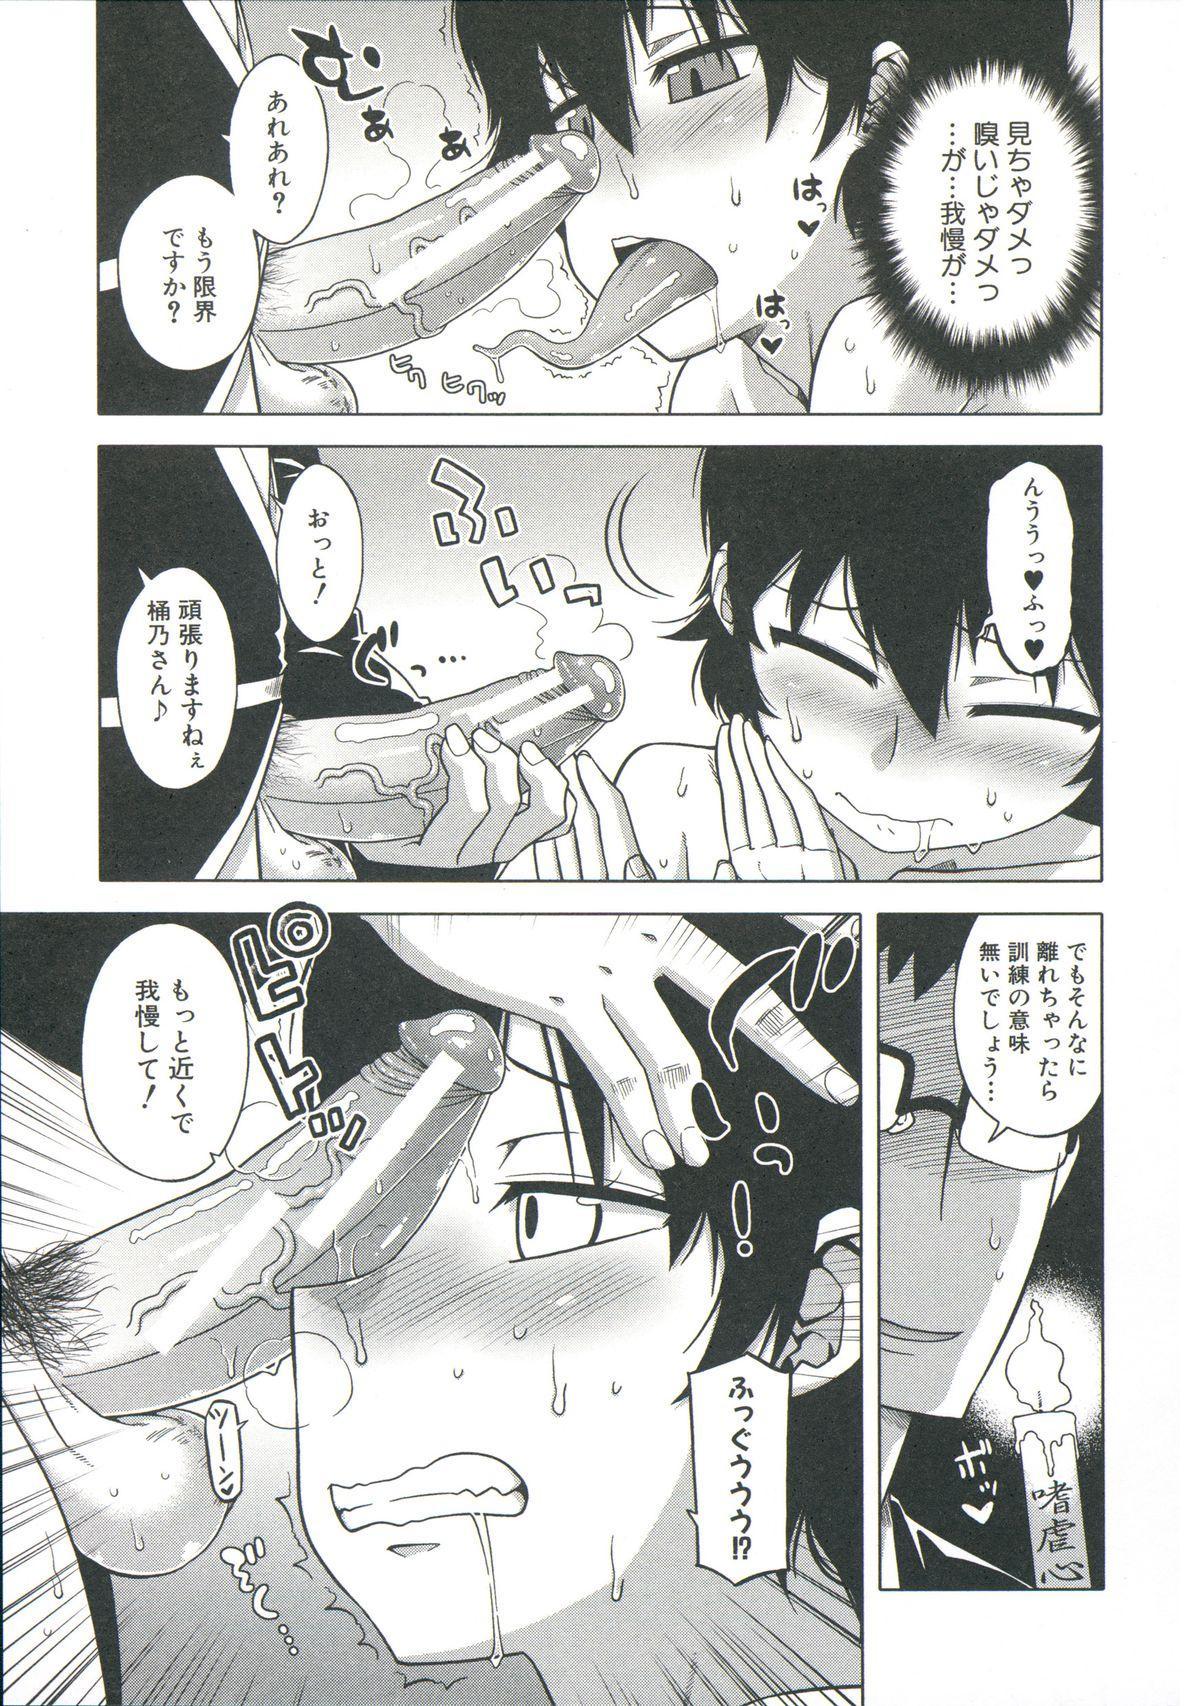 [Takatsu] Ou-sama Appli - King App 175